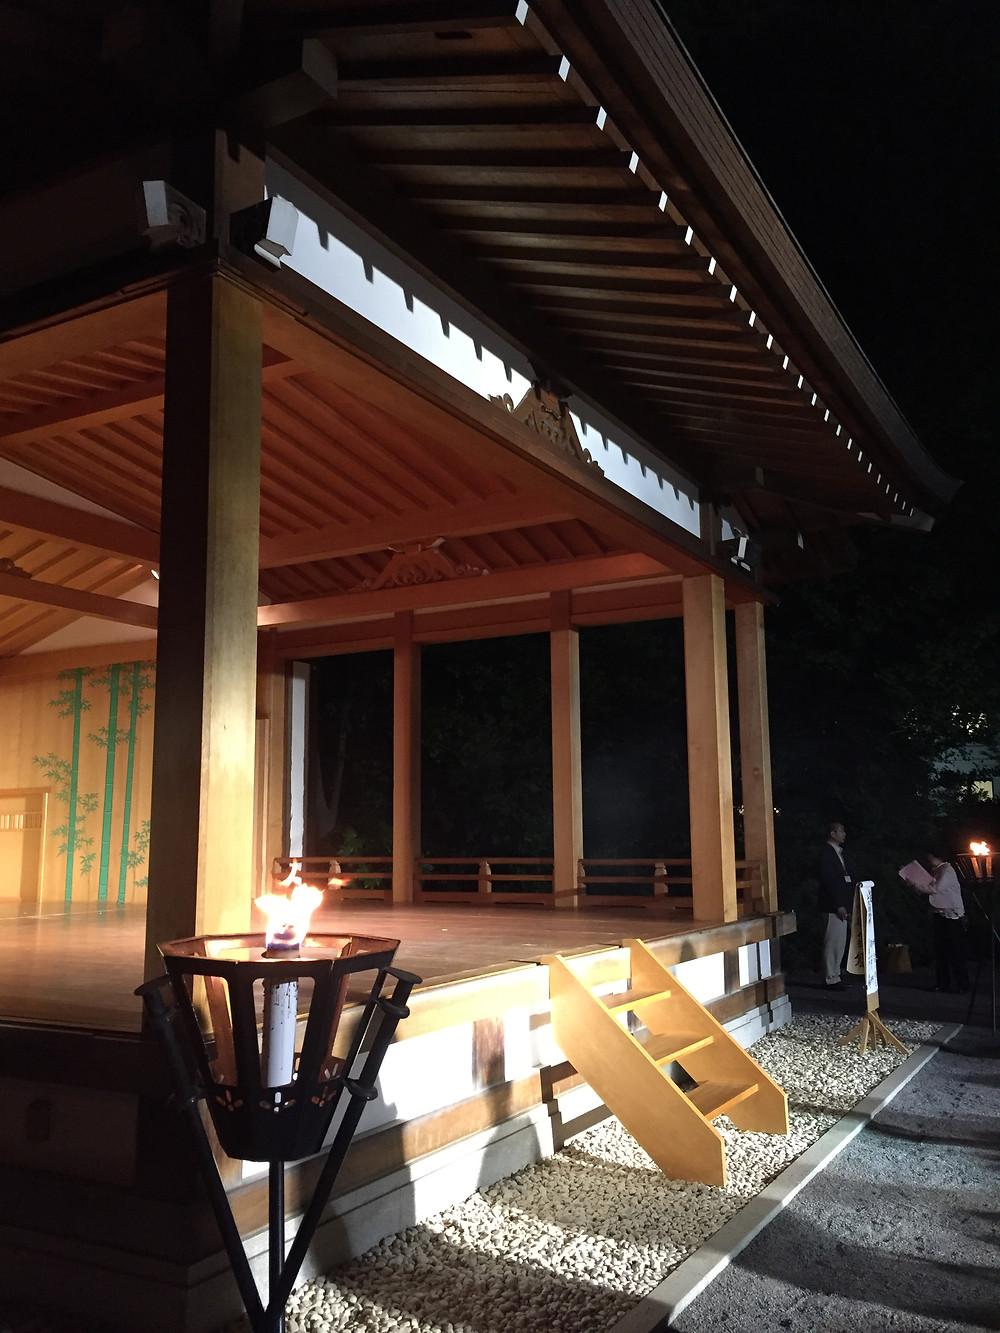 Tokyo Noh performance of Takasago, 2019